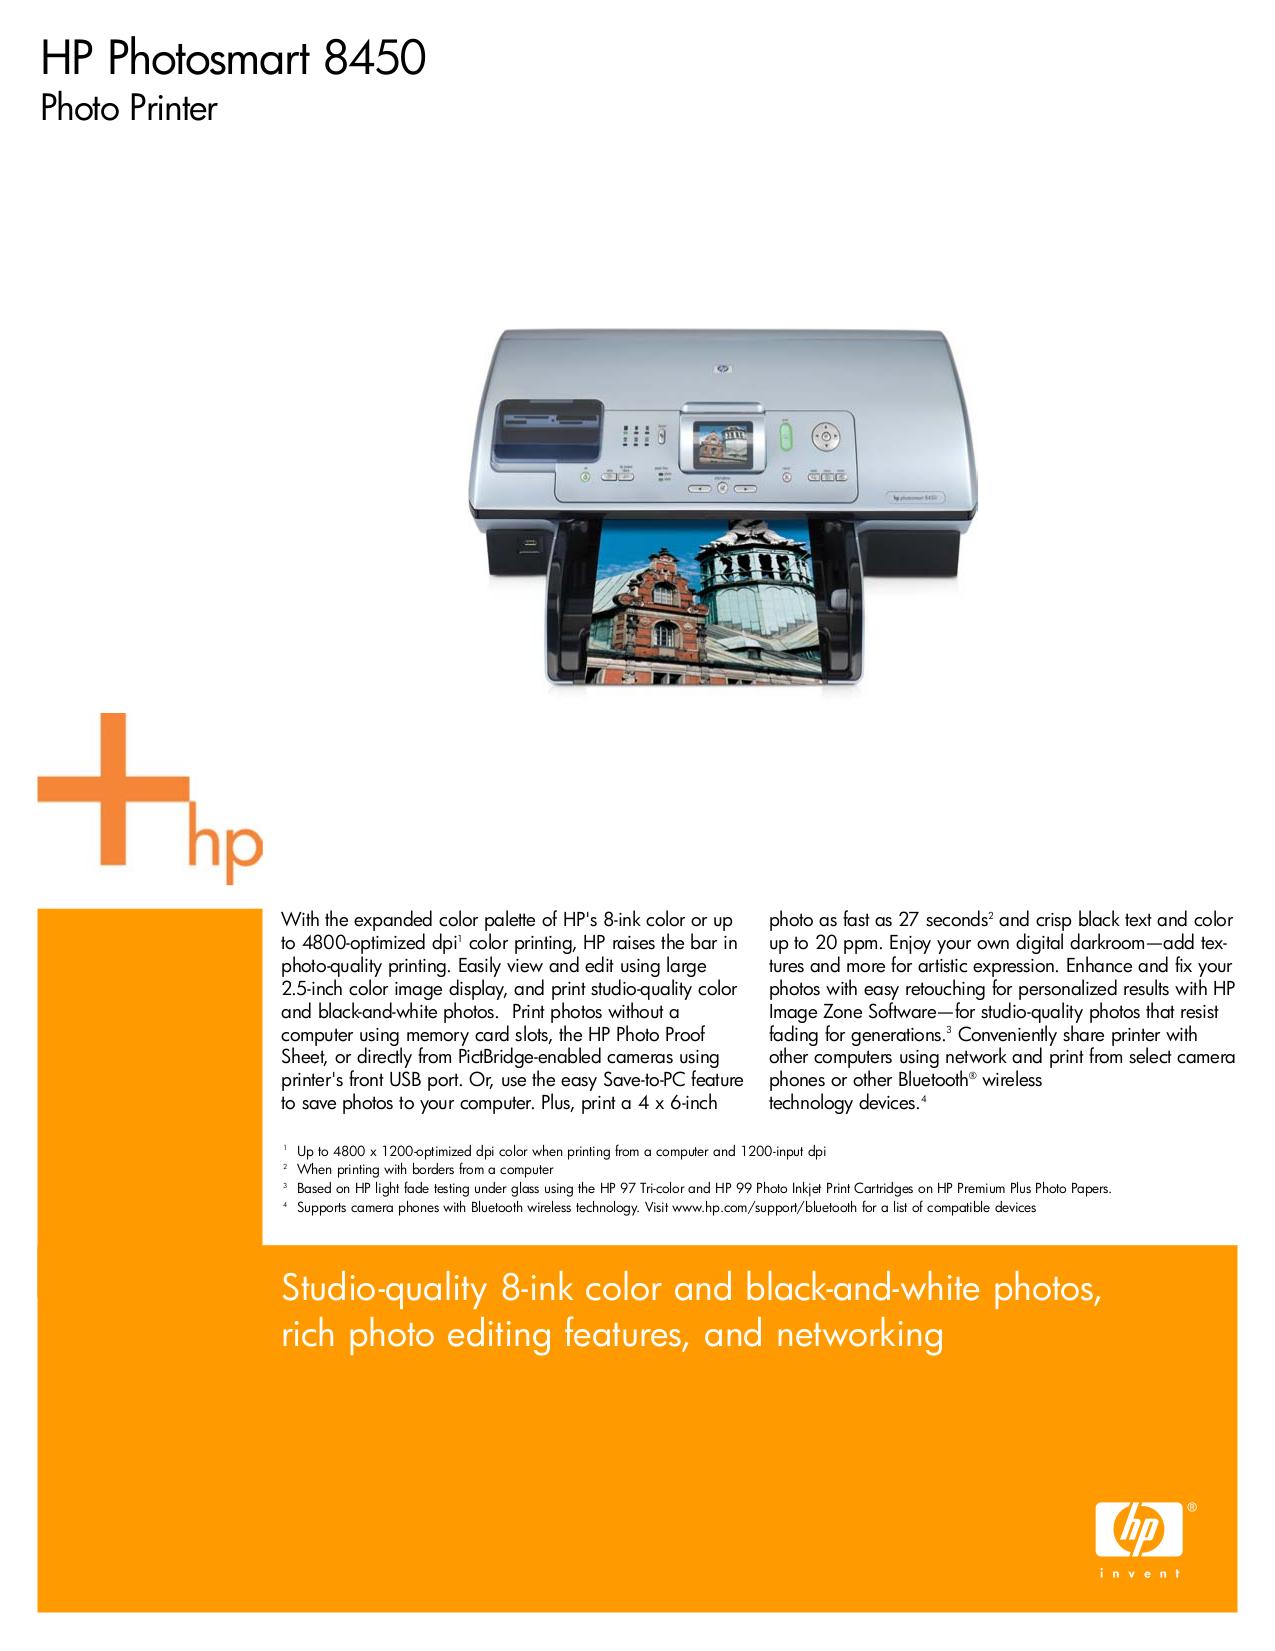 download free pdf for hp photosmart 8450 printer manual rh umlib com HP Photosmart 2610 hp photosmart 8450 user manual